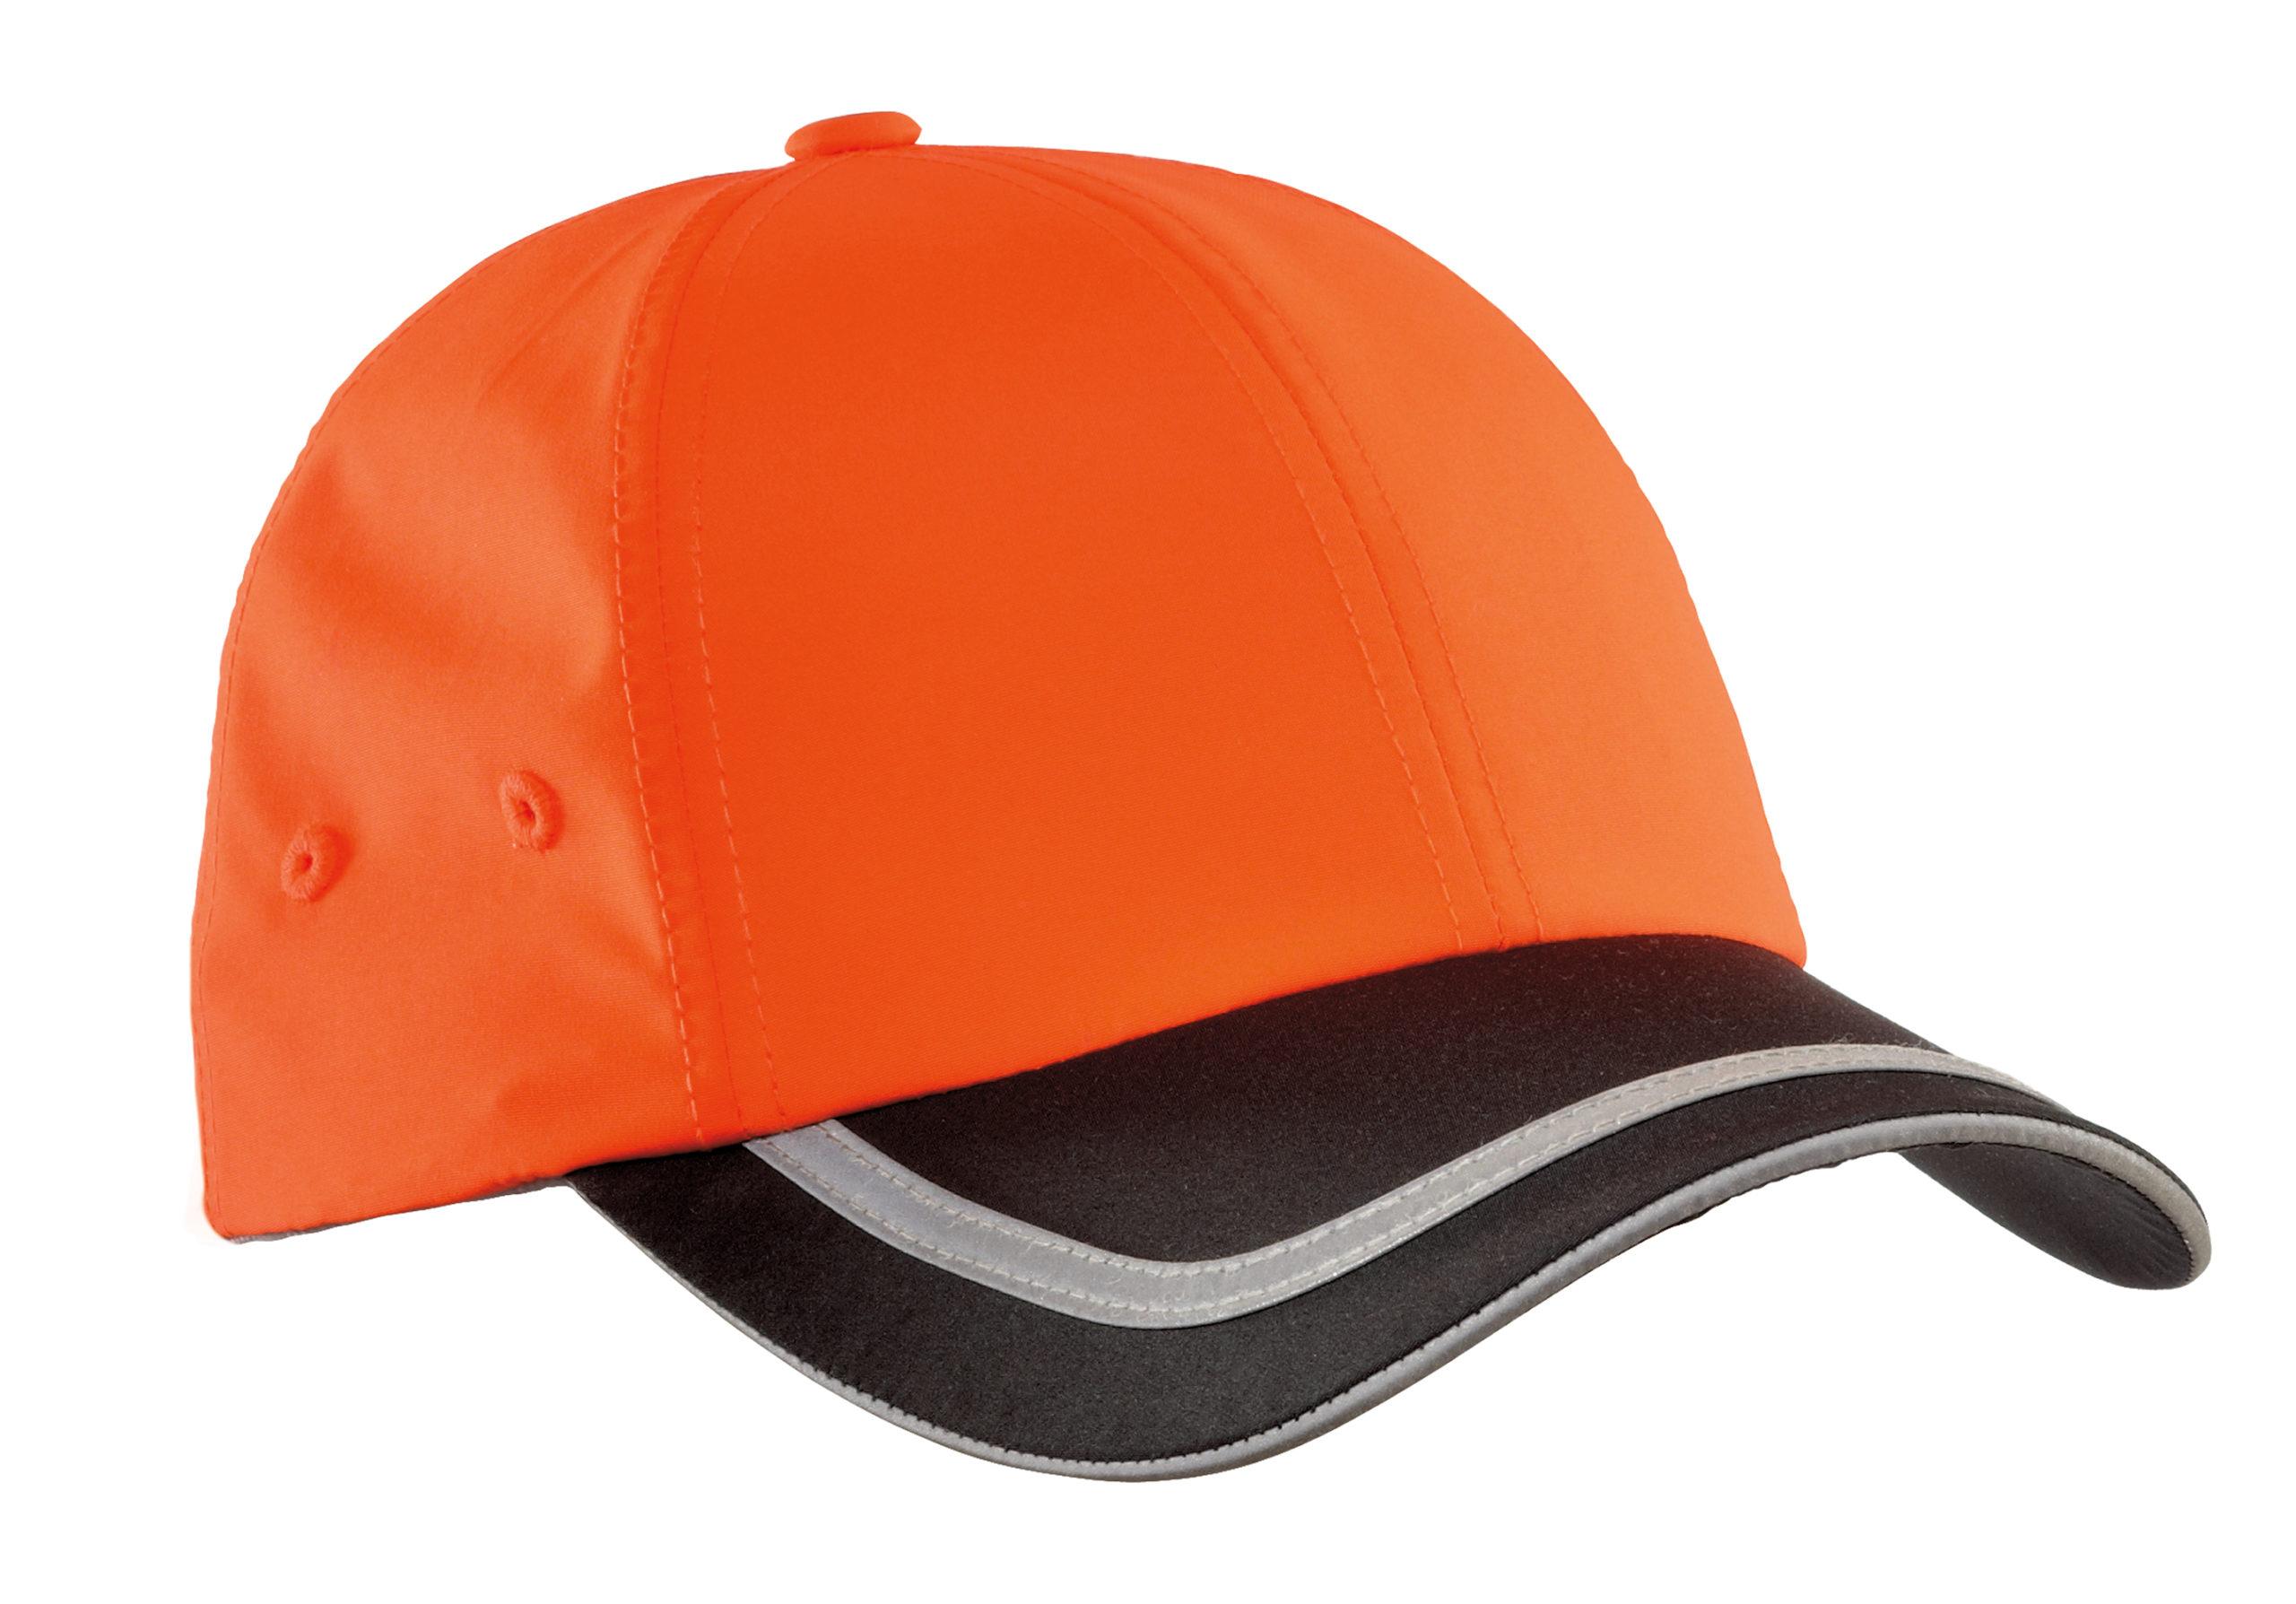 safety hat orange and black